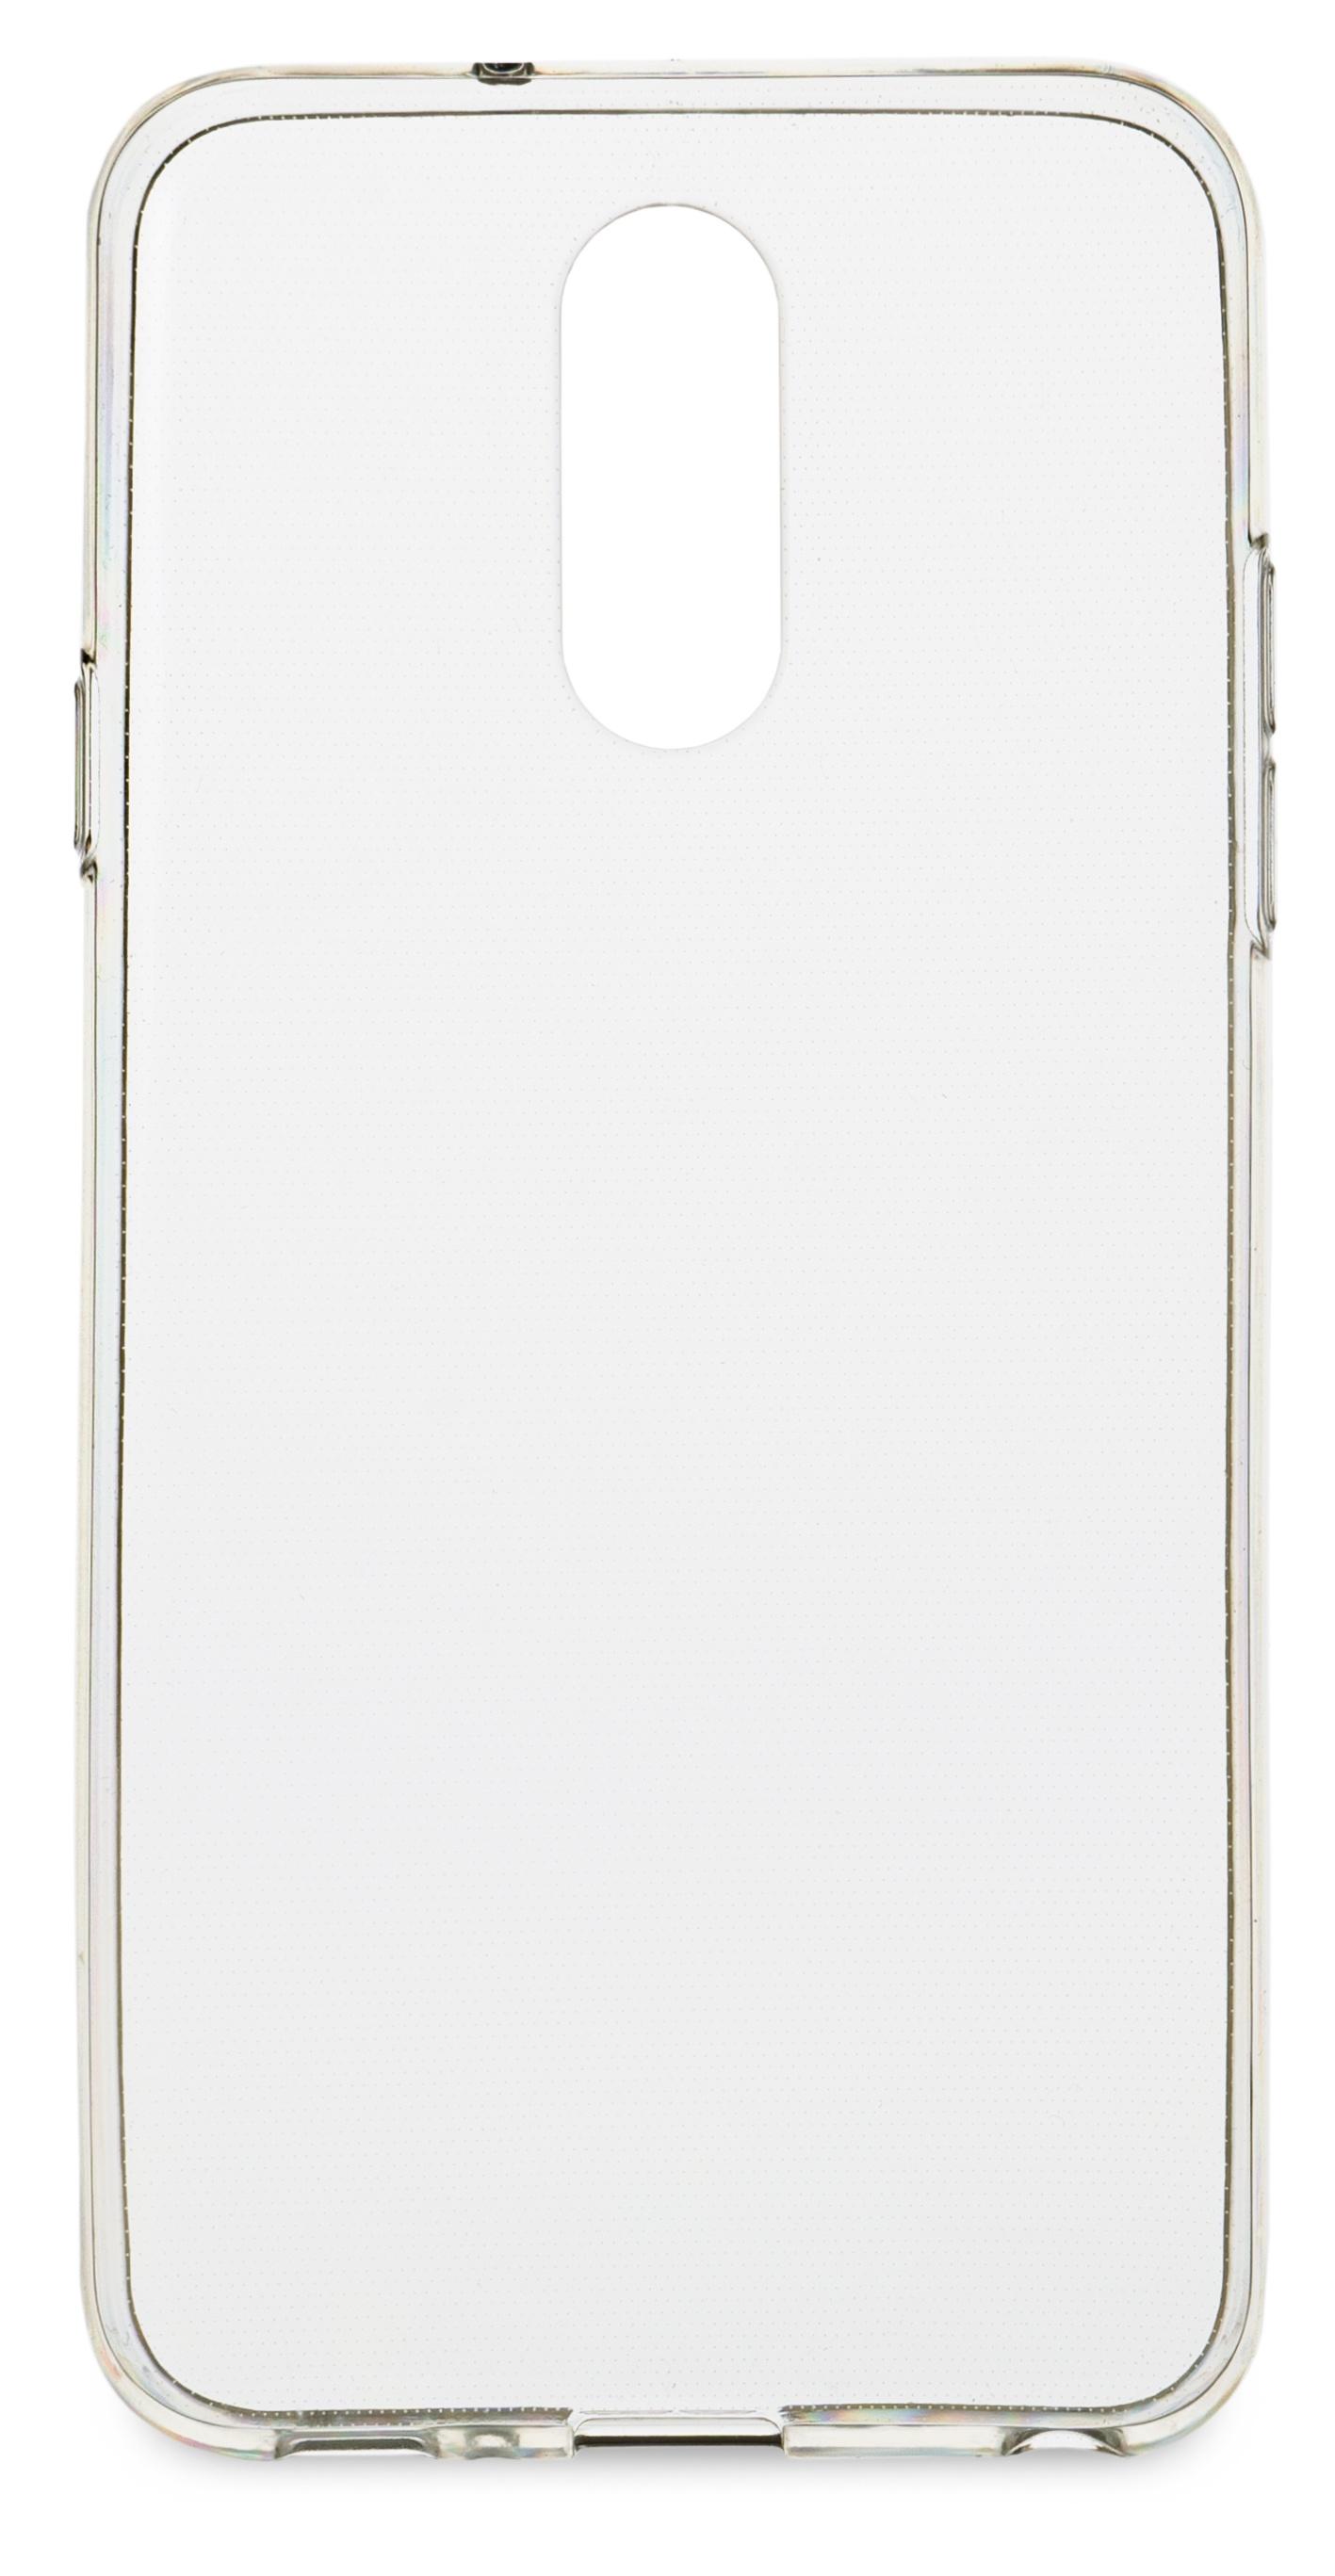 Накладка skinBOX для LG Q7, прозрачный накладка skinbox для lg g4s 2000000079226 черный